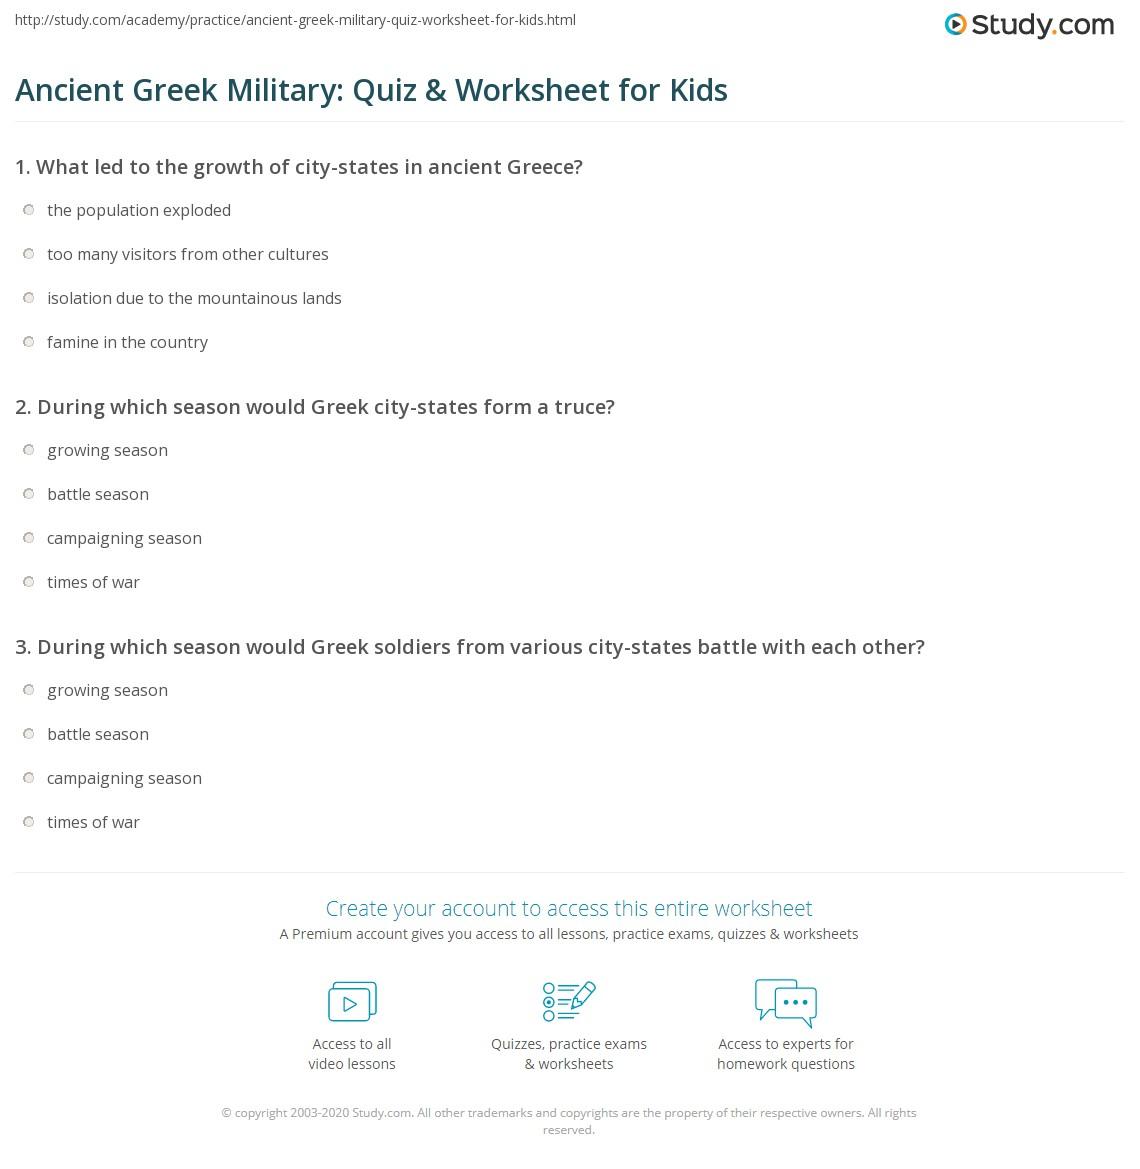 Ancient Greek Military Quiz Amp Worksheet For Kids